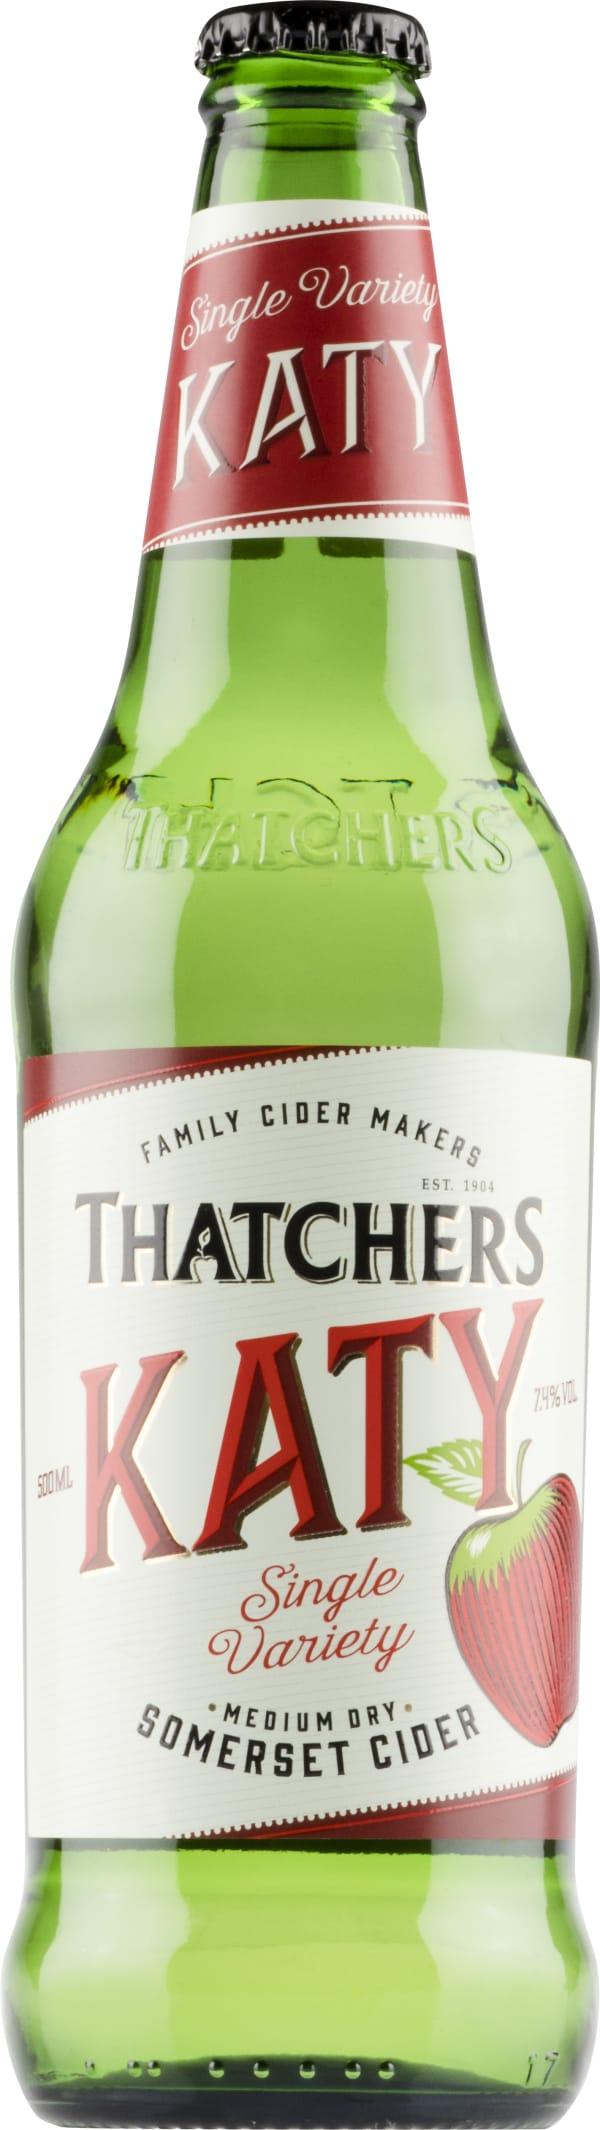 Thatchers Single Variety Katy